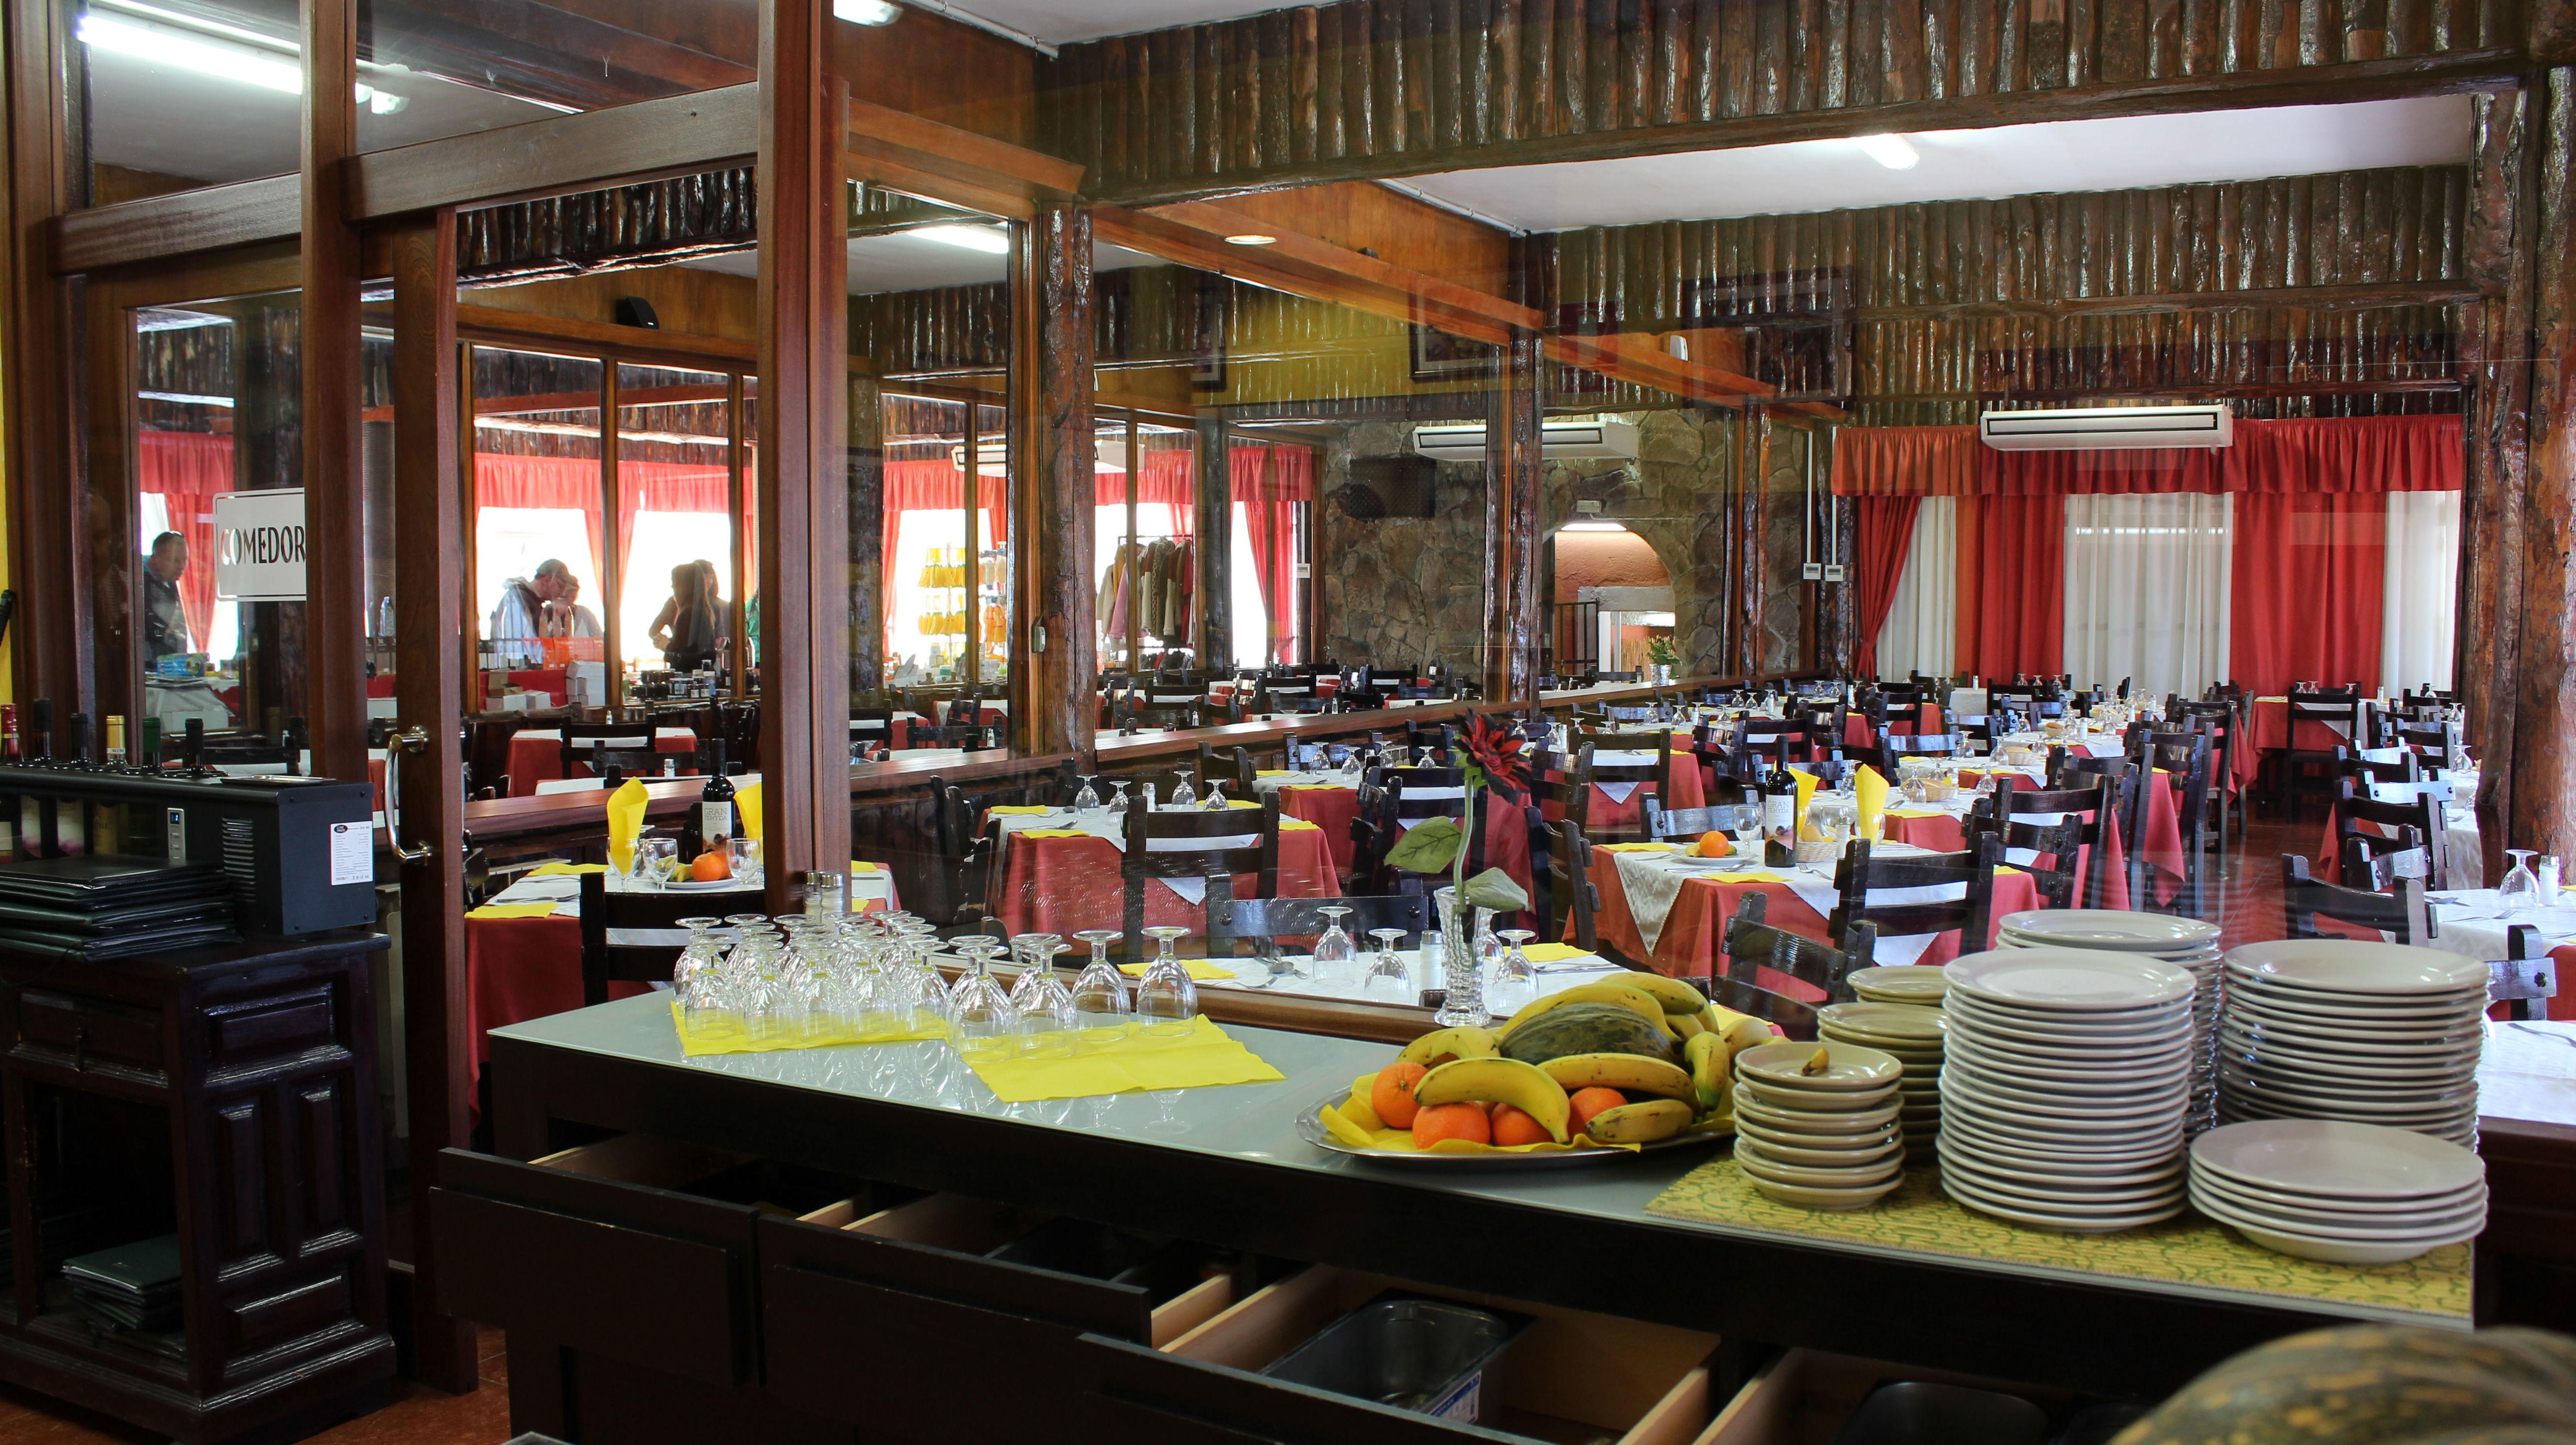 Restaurante para comer cerca del Teide